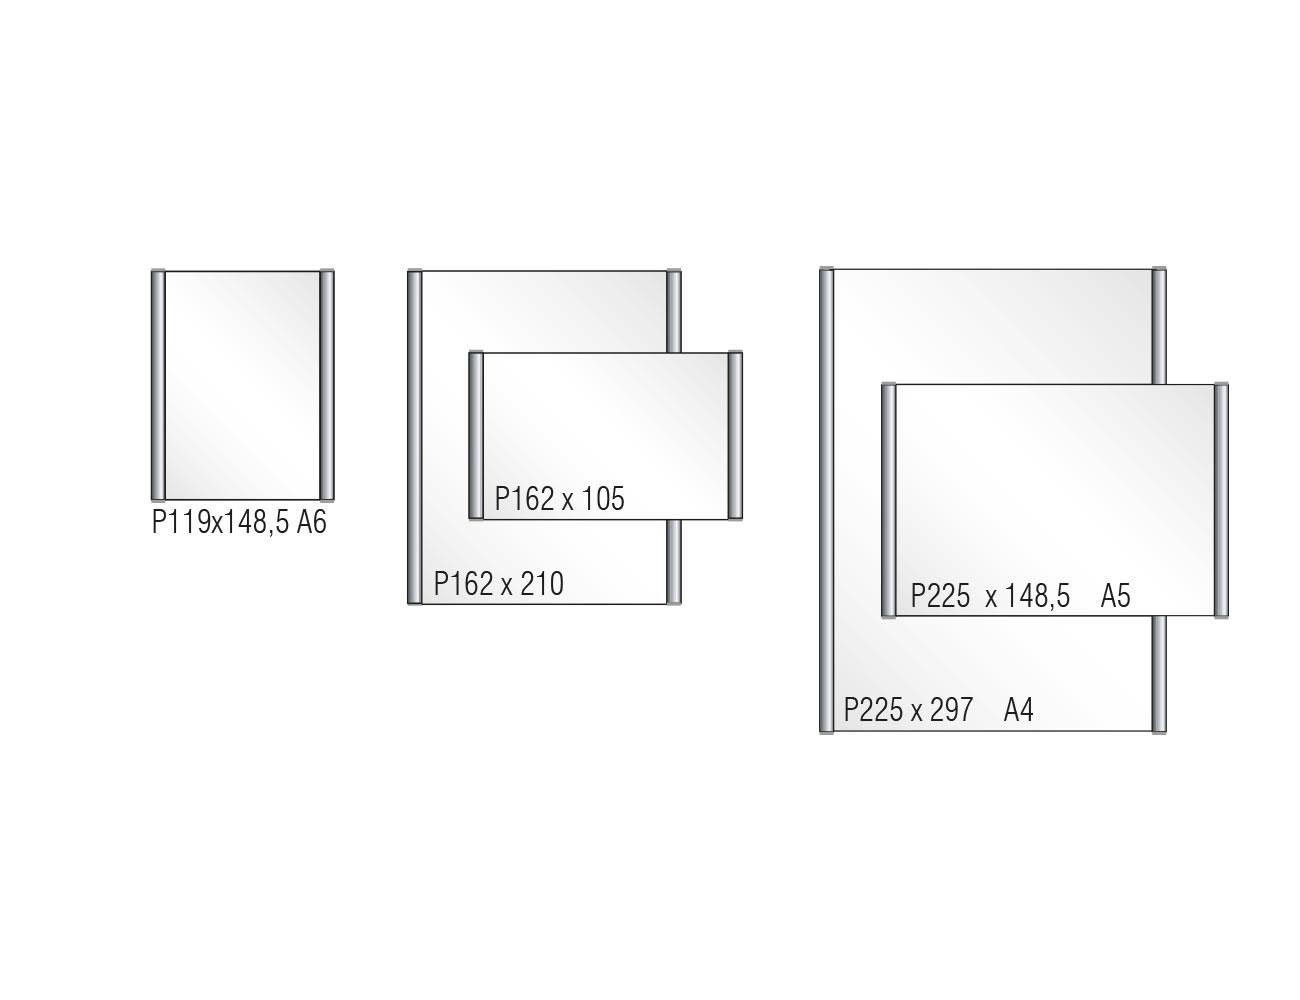 Türschild PLANO - Varianten